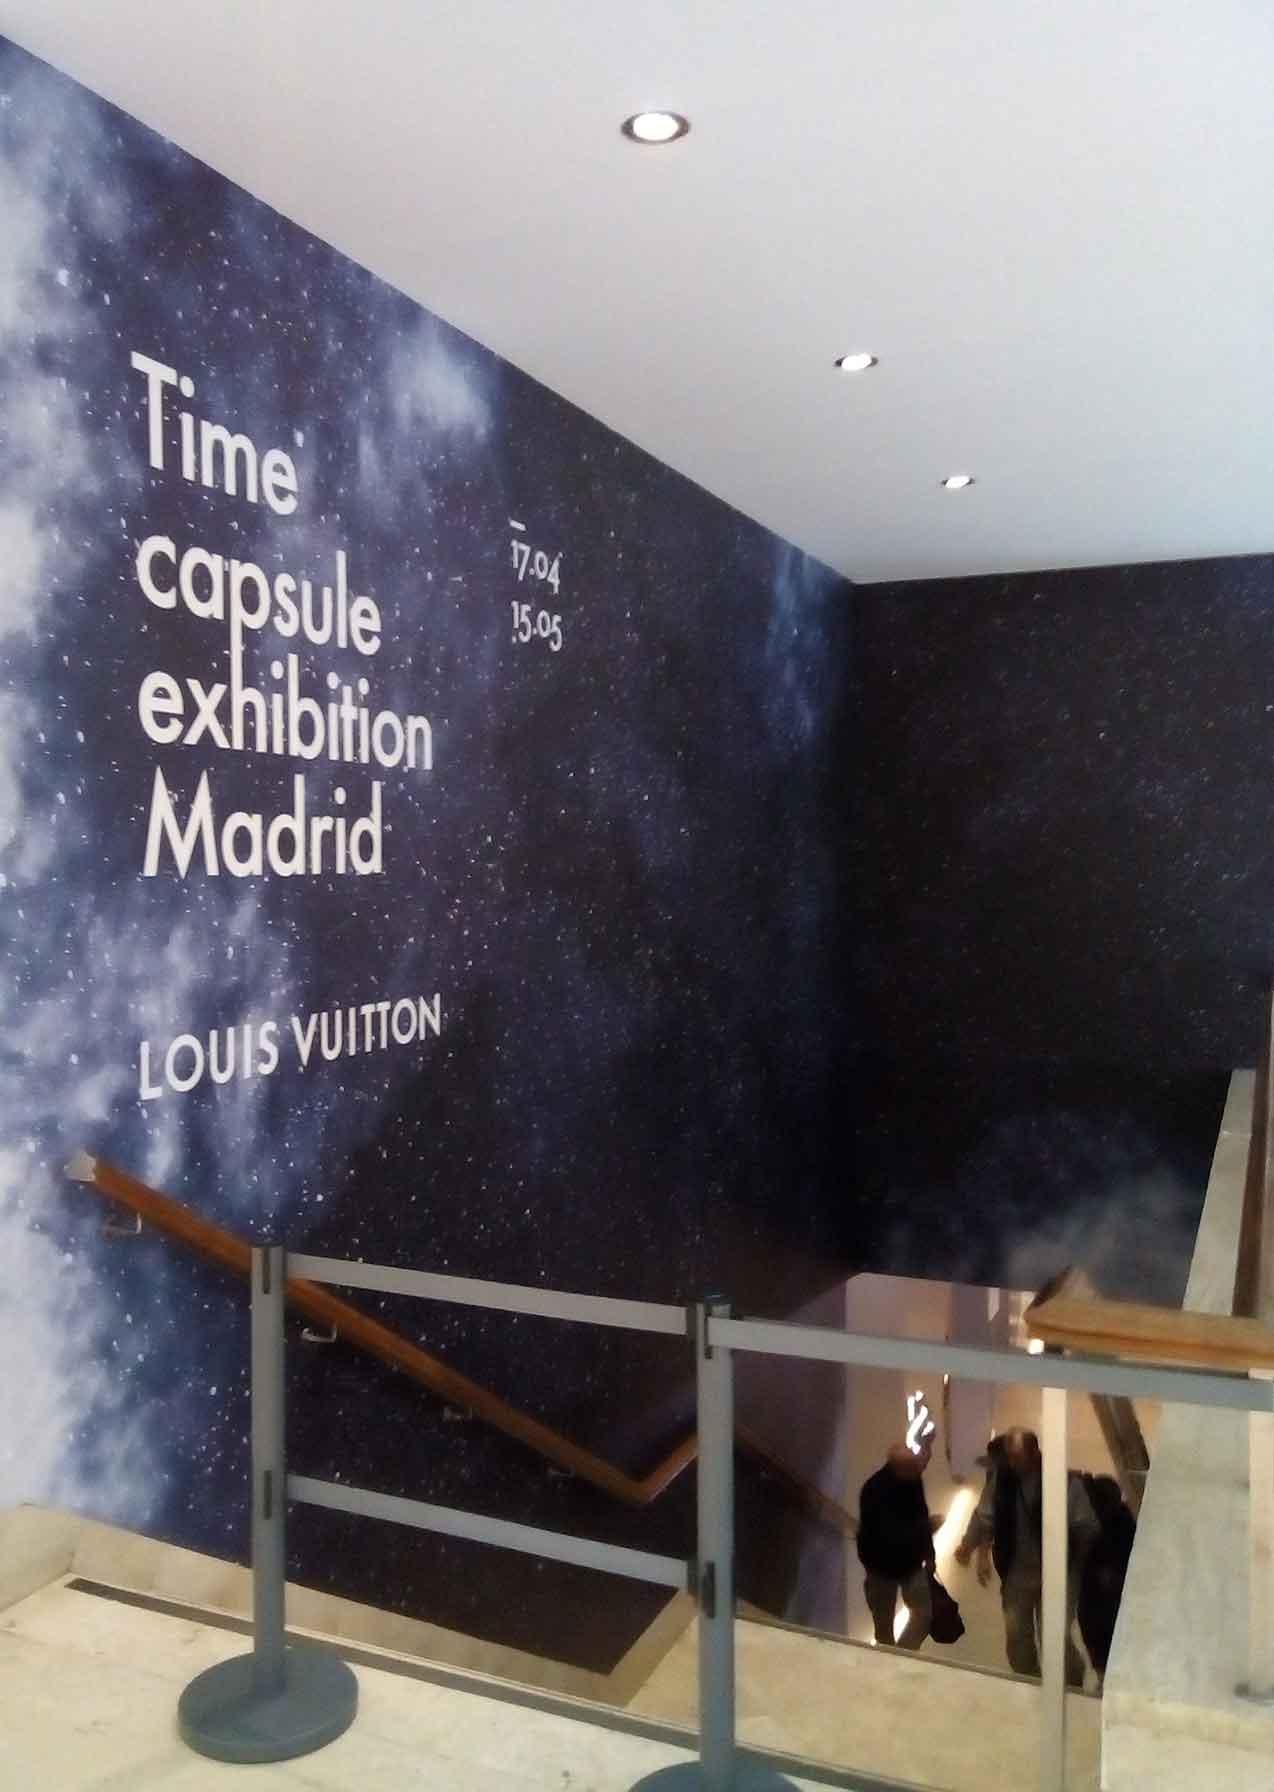 impresion-digital-para-evento-capsule-louis-vuiton